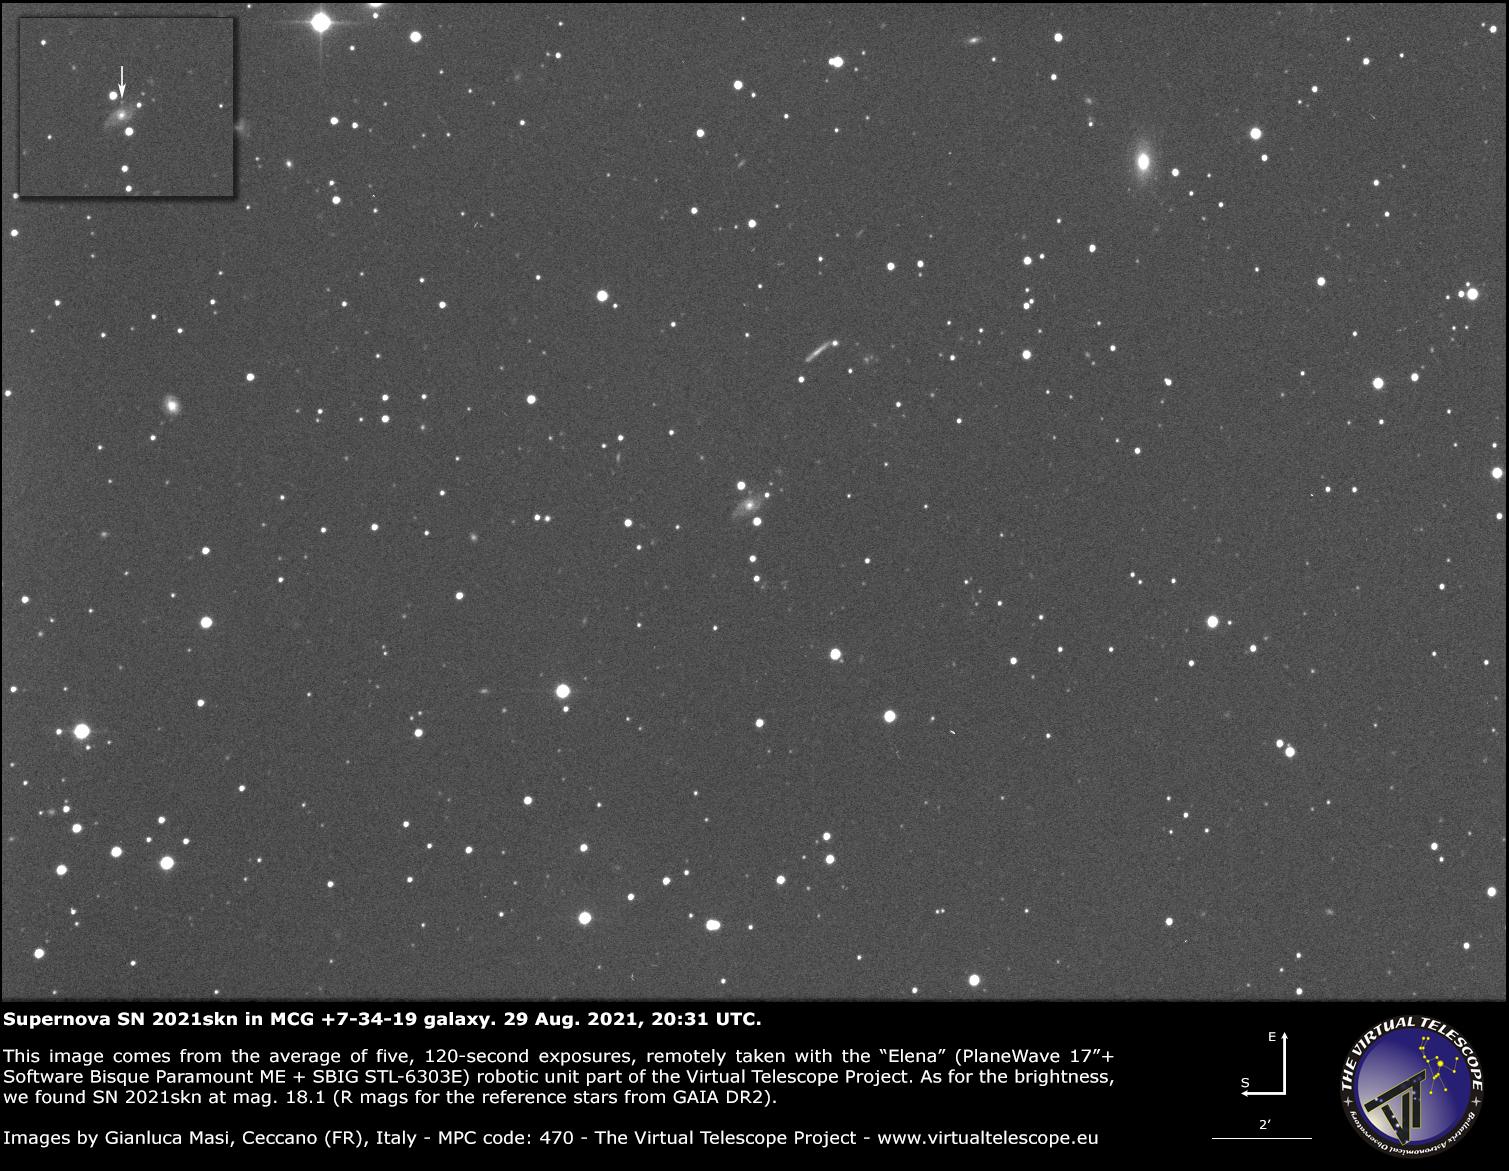 SN 2021skn in MCG +07-34-019 galaxy: 29 Aug. 2021.